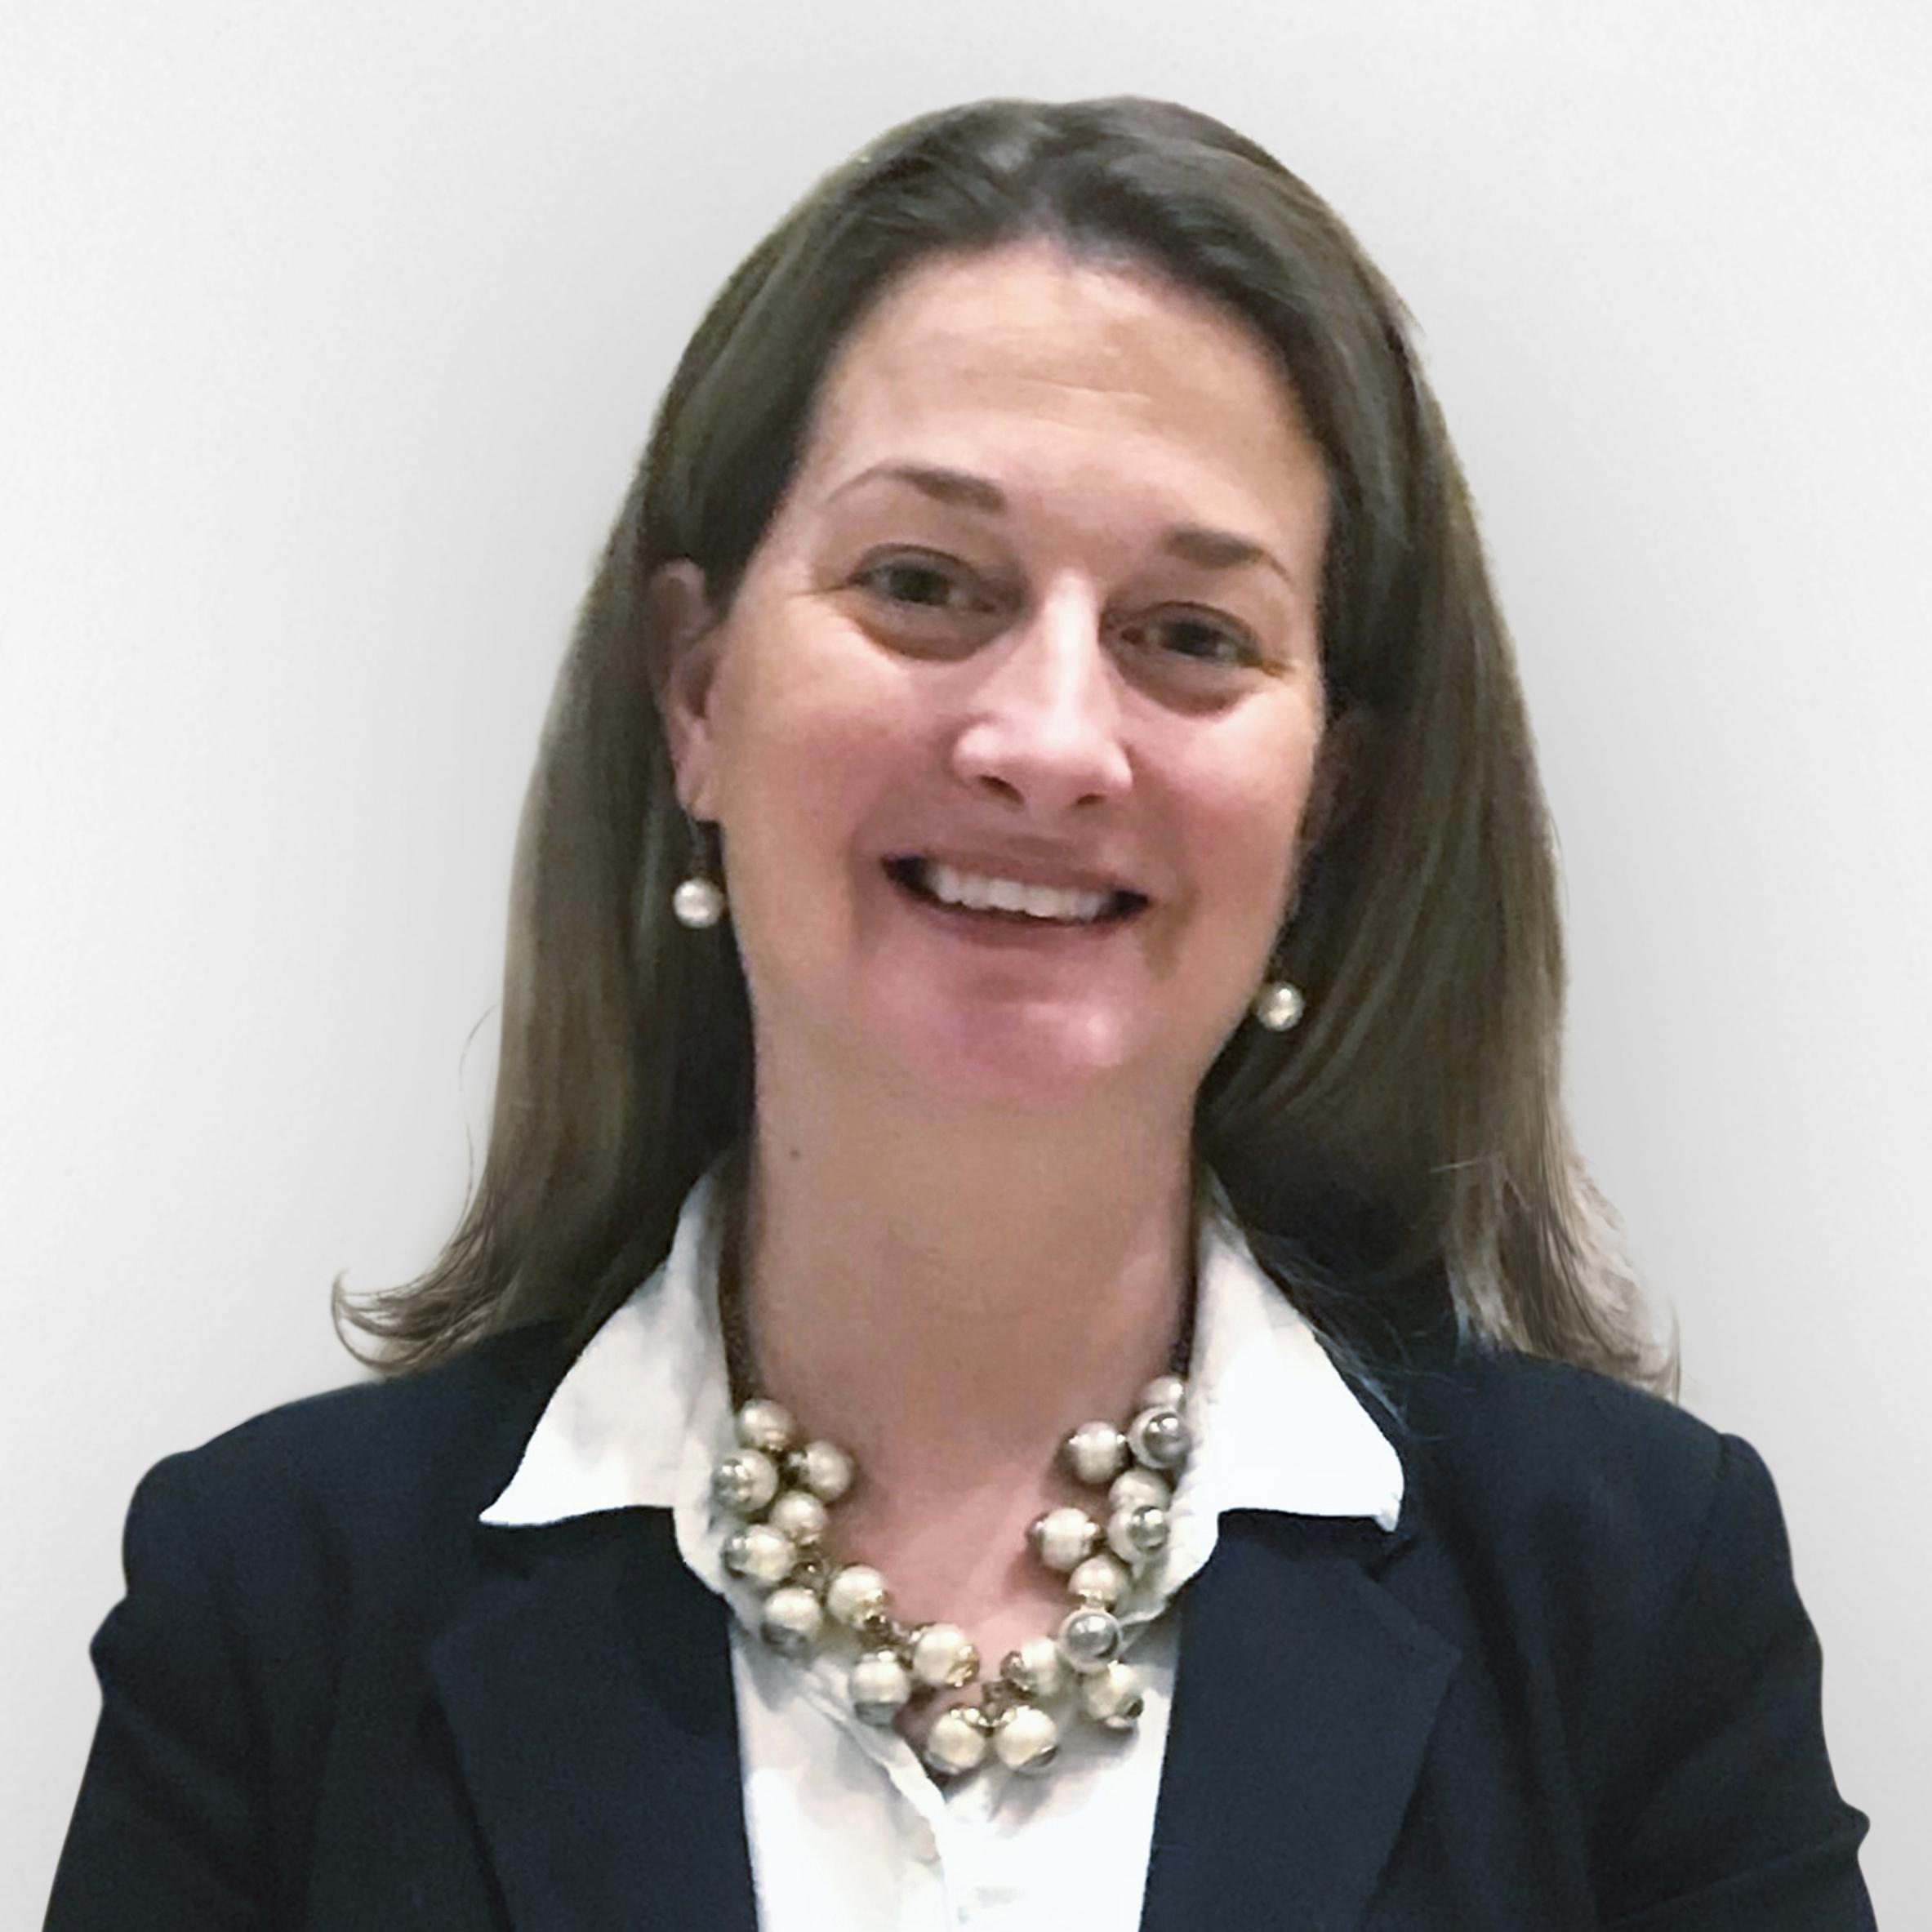 Caitlin Morse - PR Manager